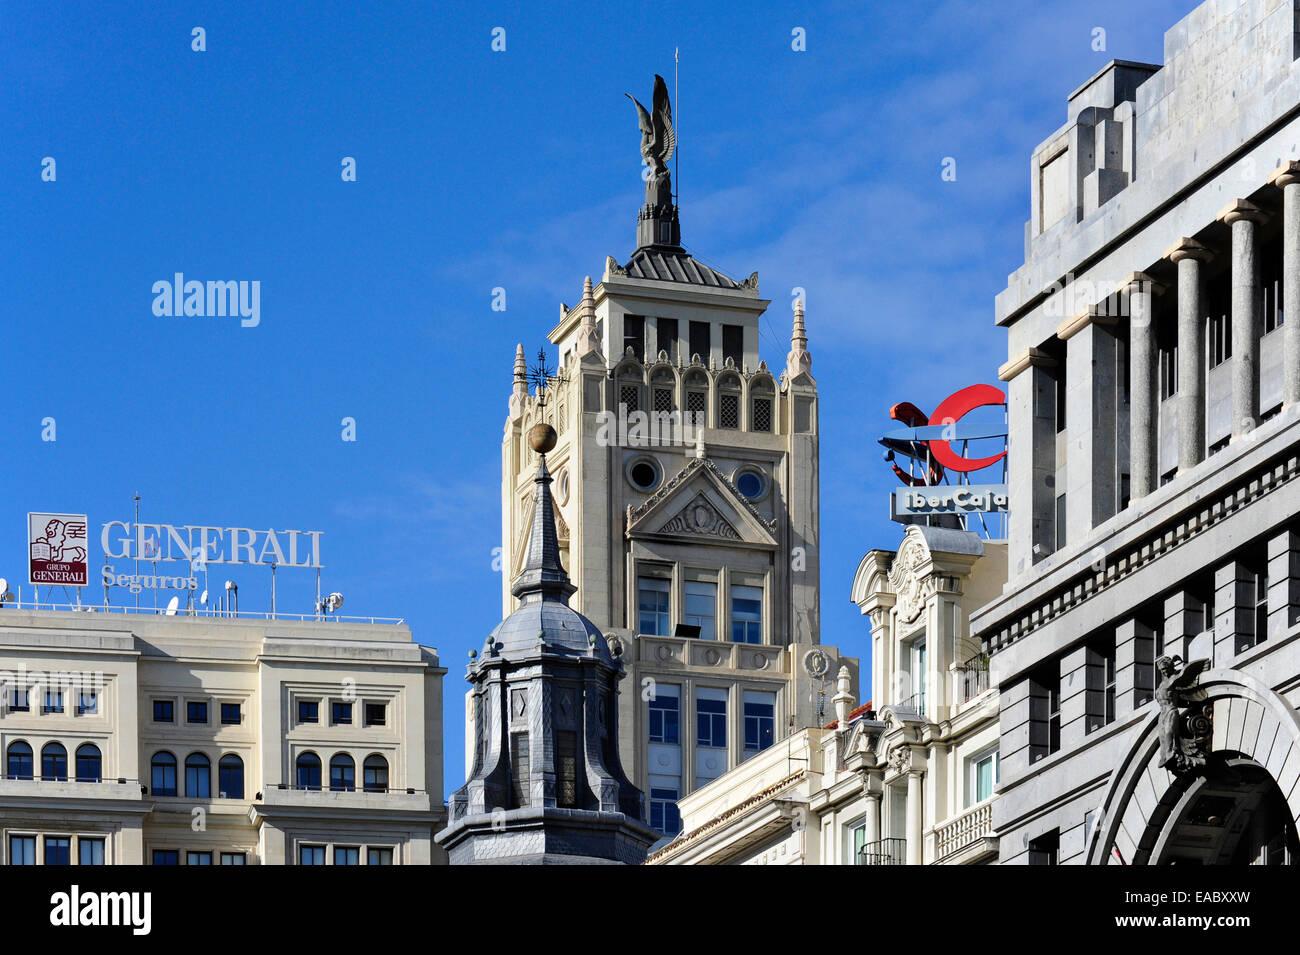 Spain Madrid neoclassical office tower La Union y el Fenix Espanol - Stock Image